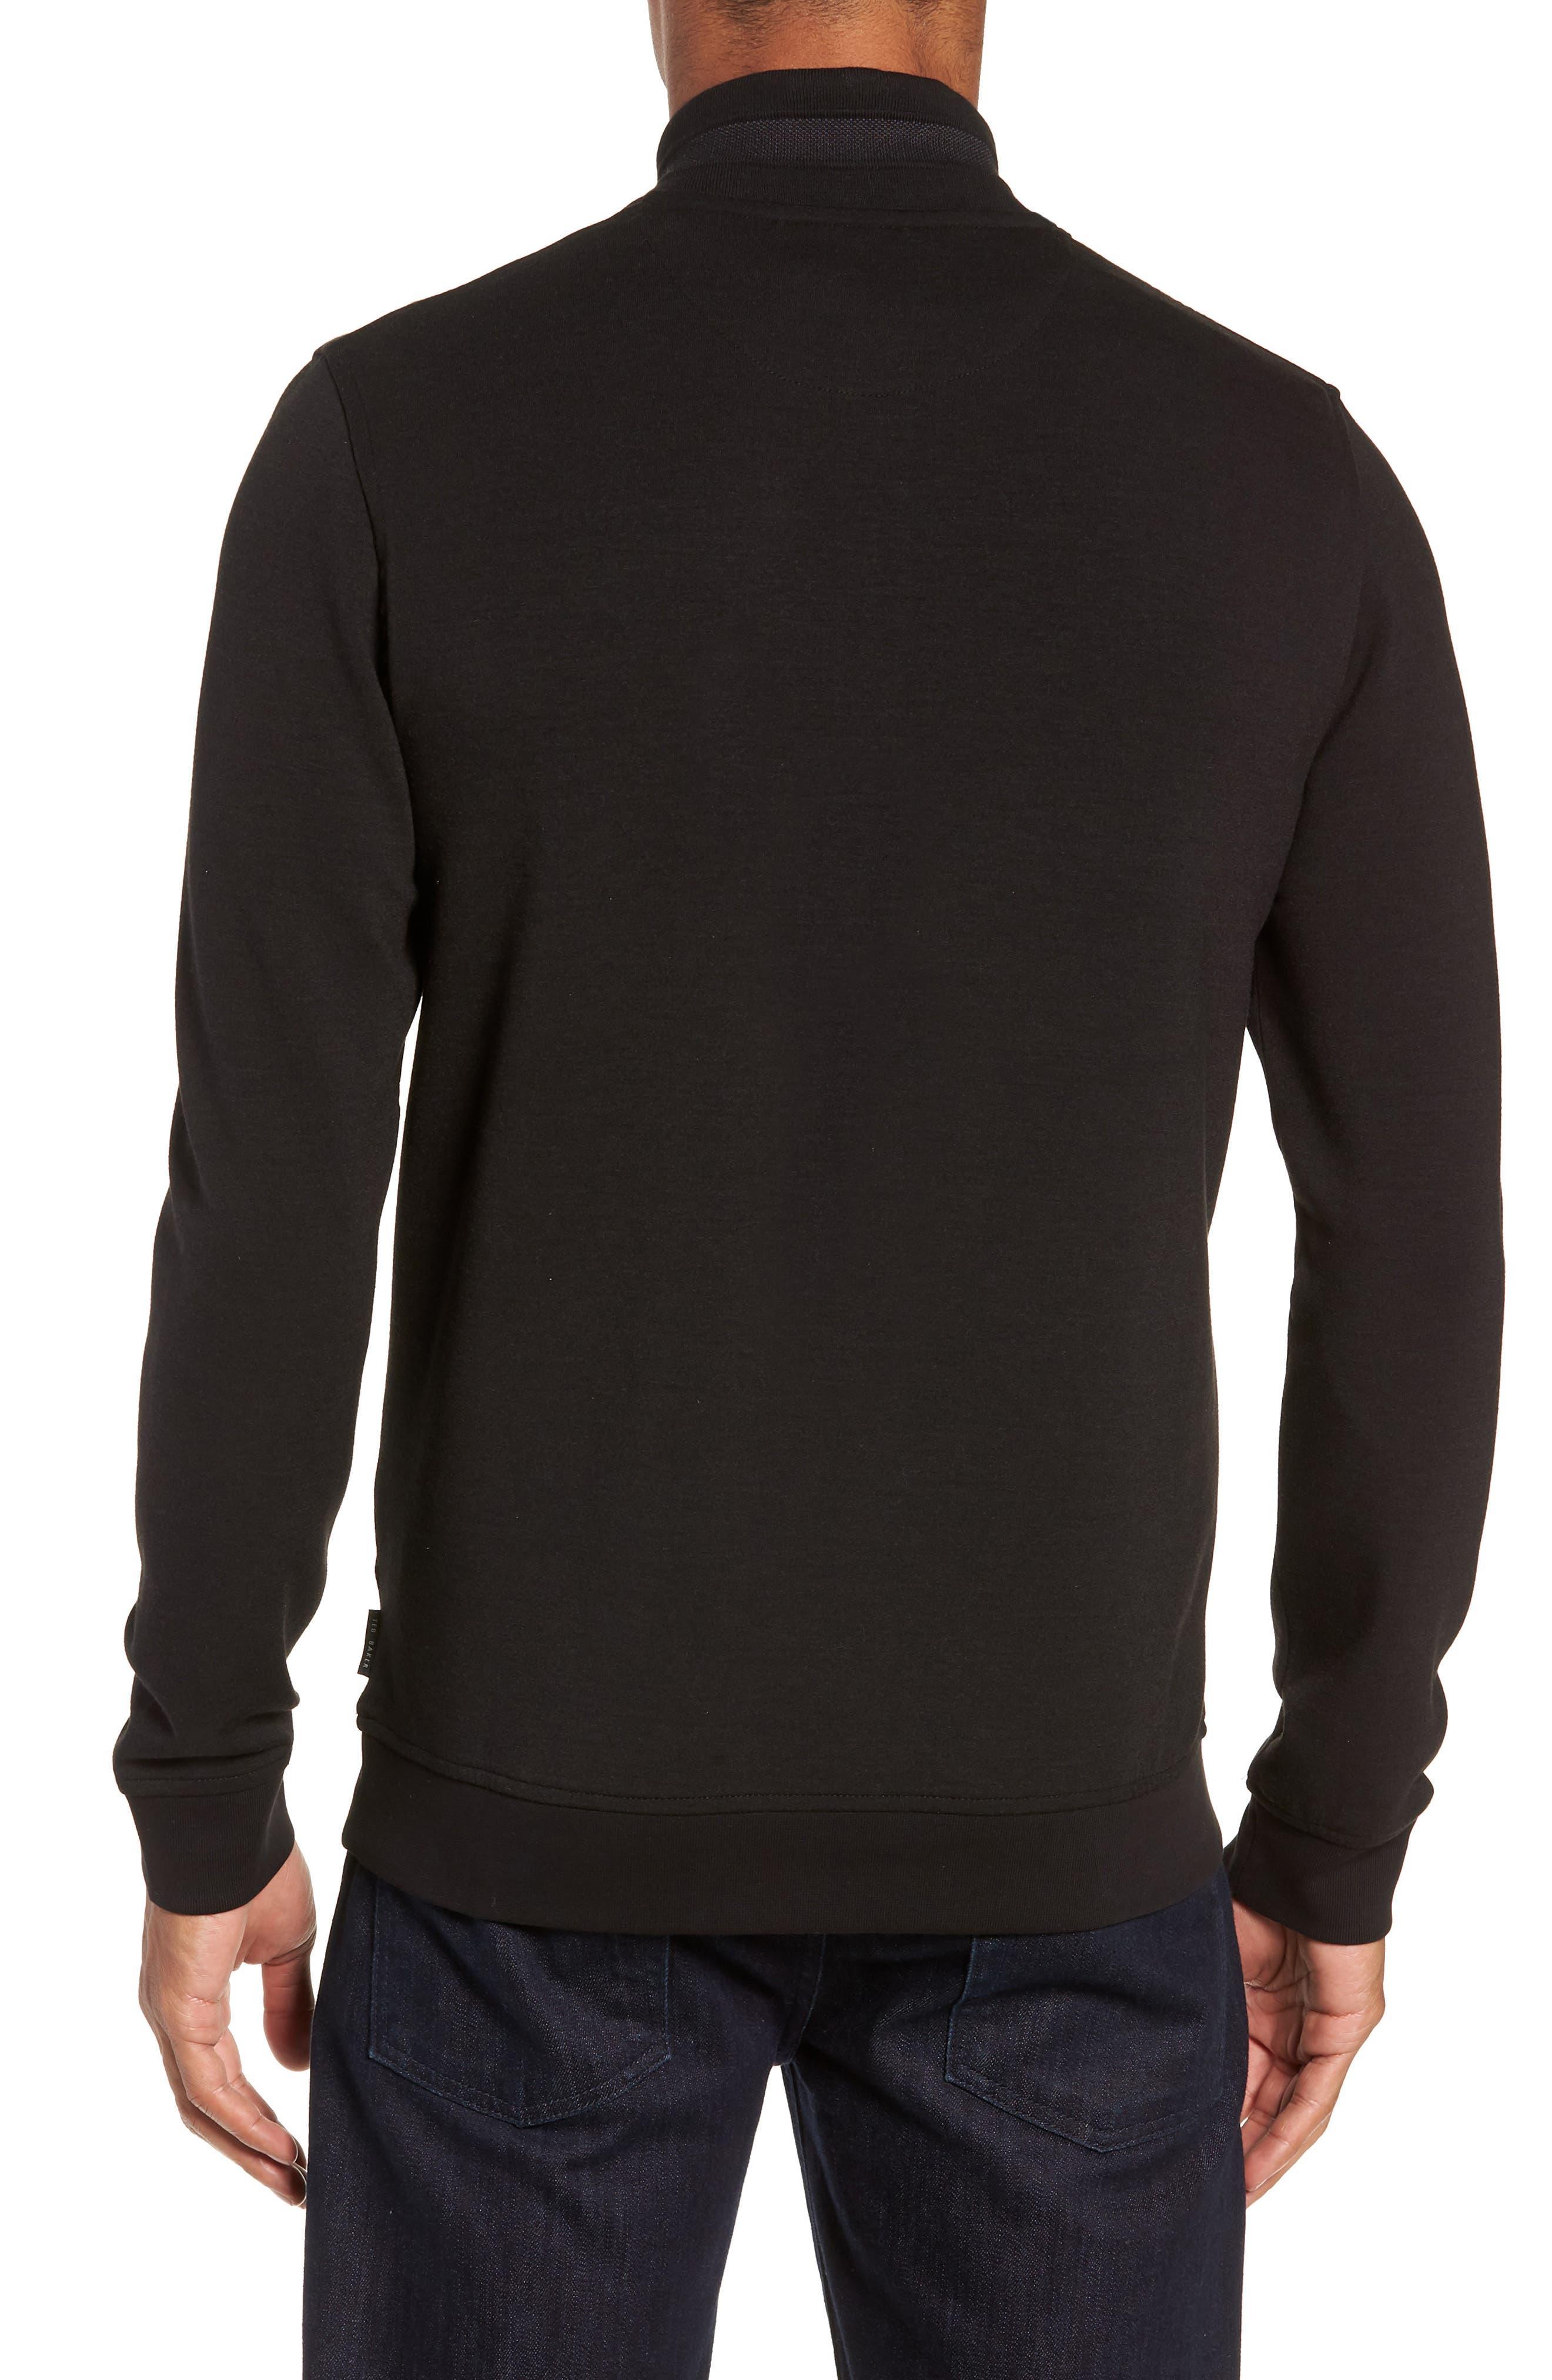 Peper Trim Fit Half Zip Pullover,                             Alternate thumbnail 2, color,                             001